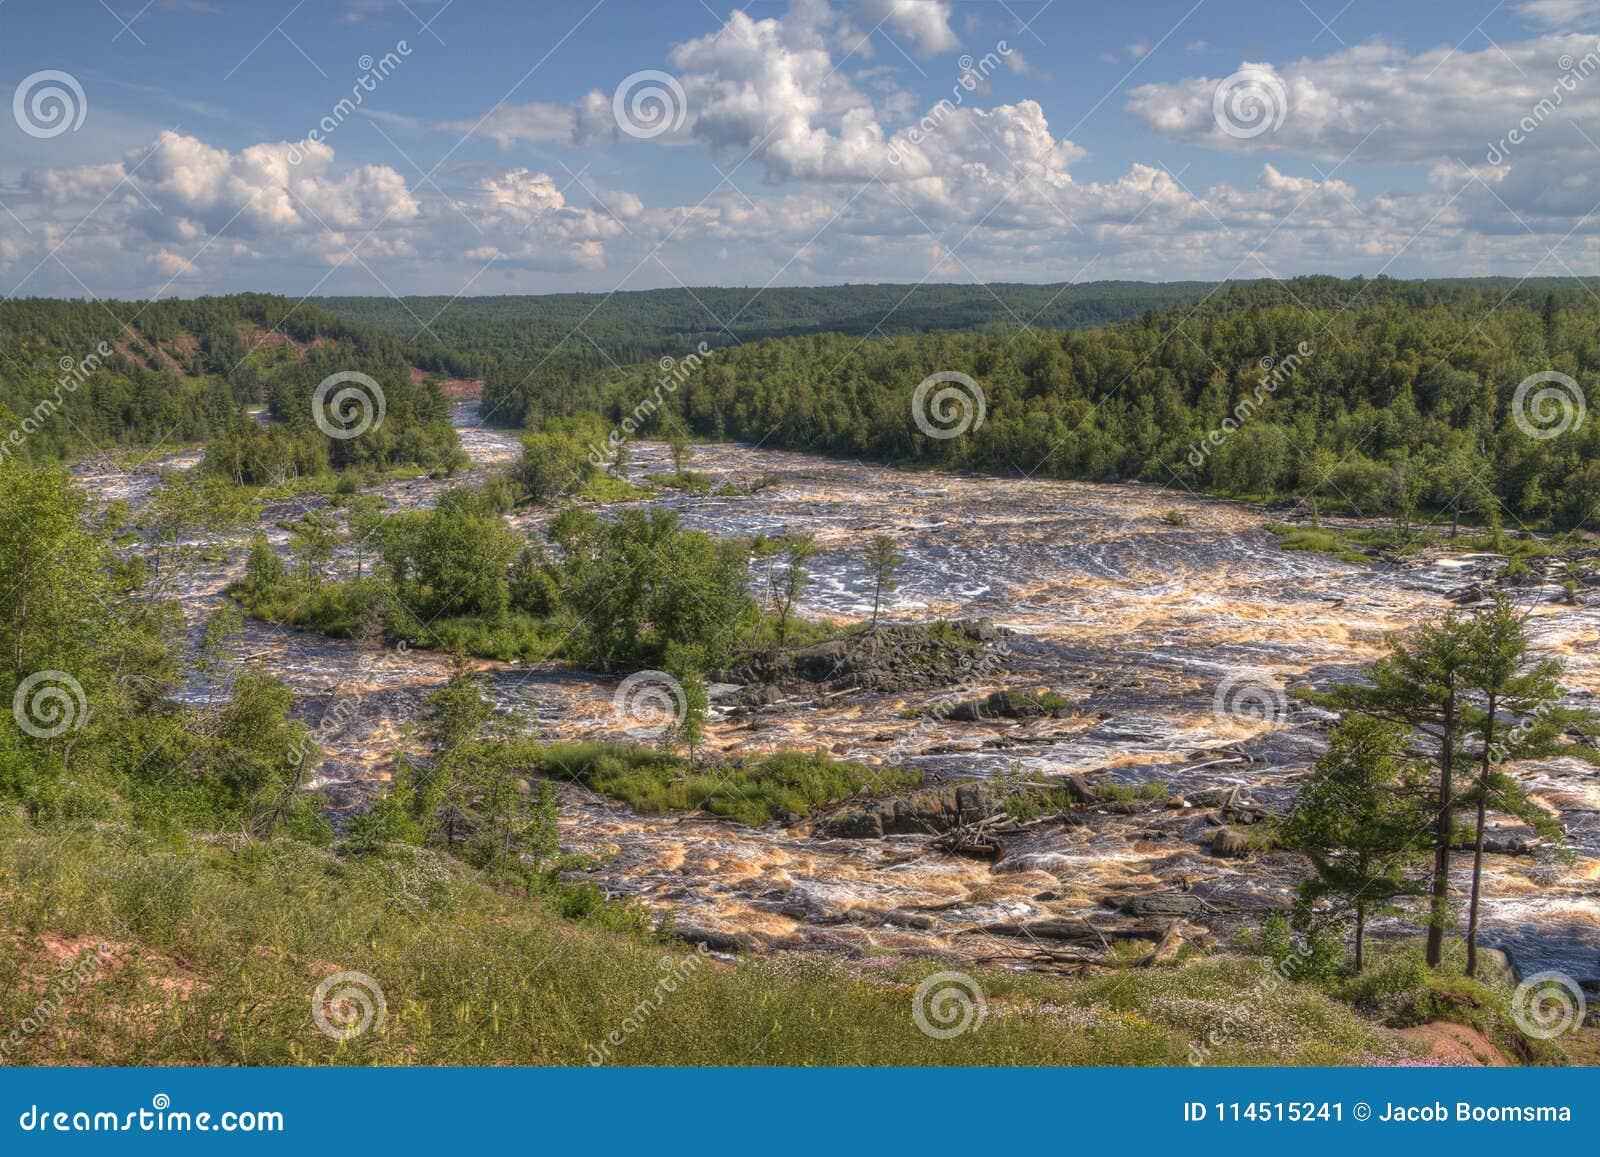 Парк штата Джэй Cooke на реке Сент-Луис к югу от Дулута в Минесоте